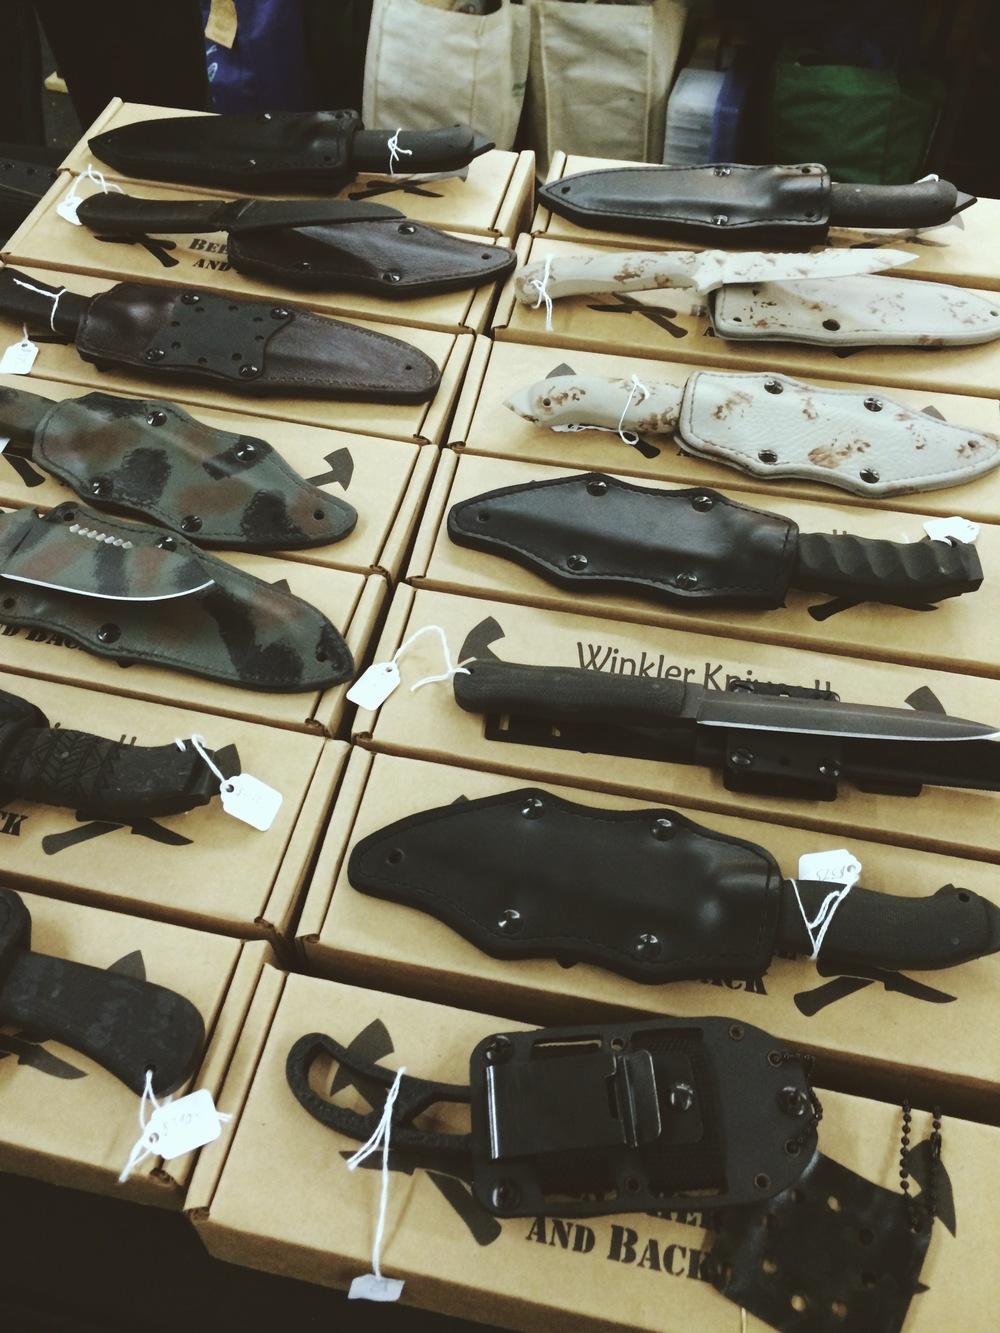 Winklerknives